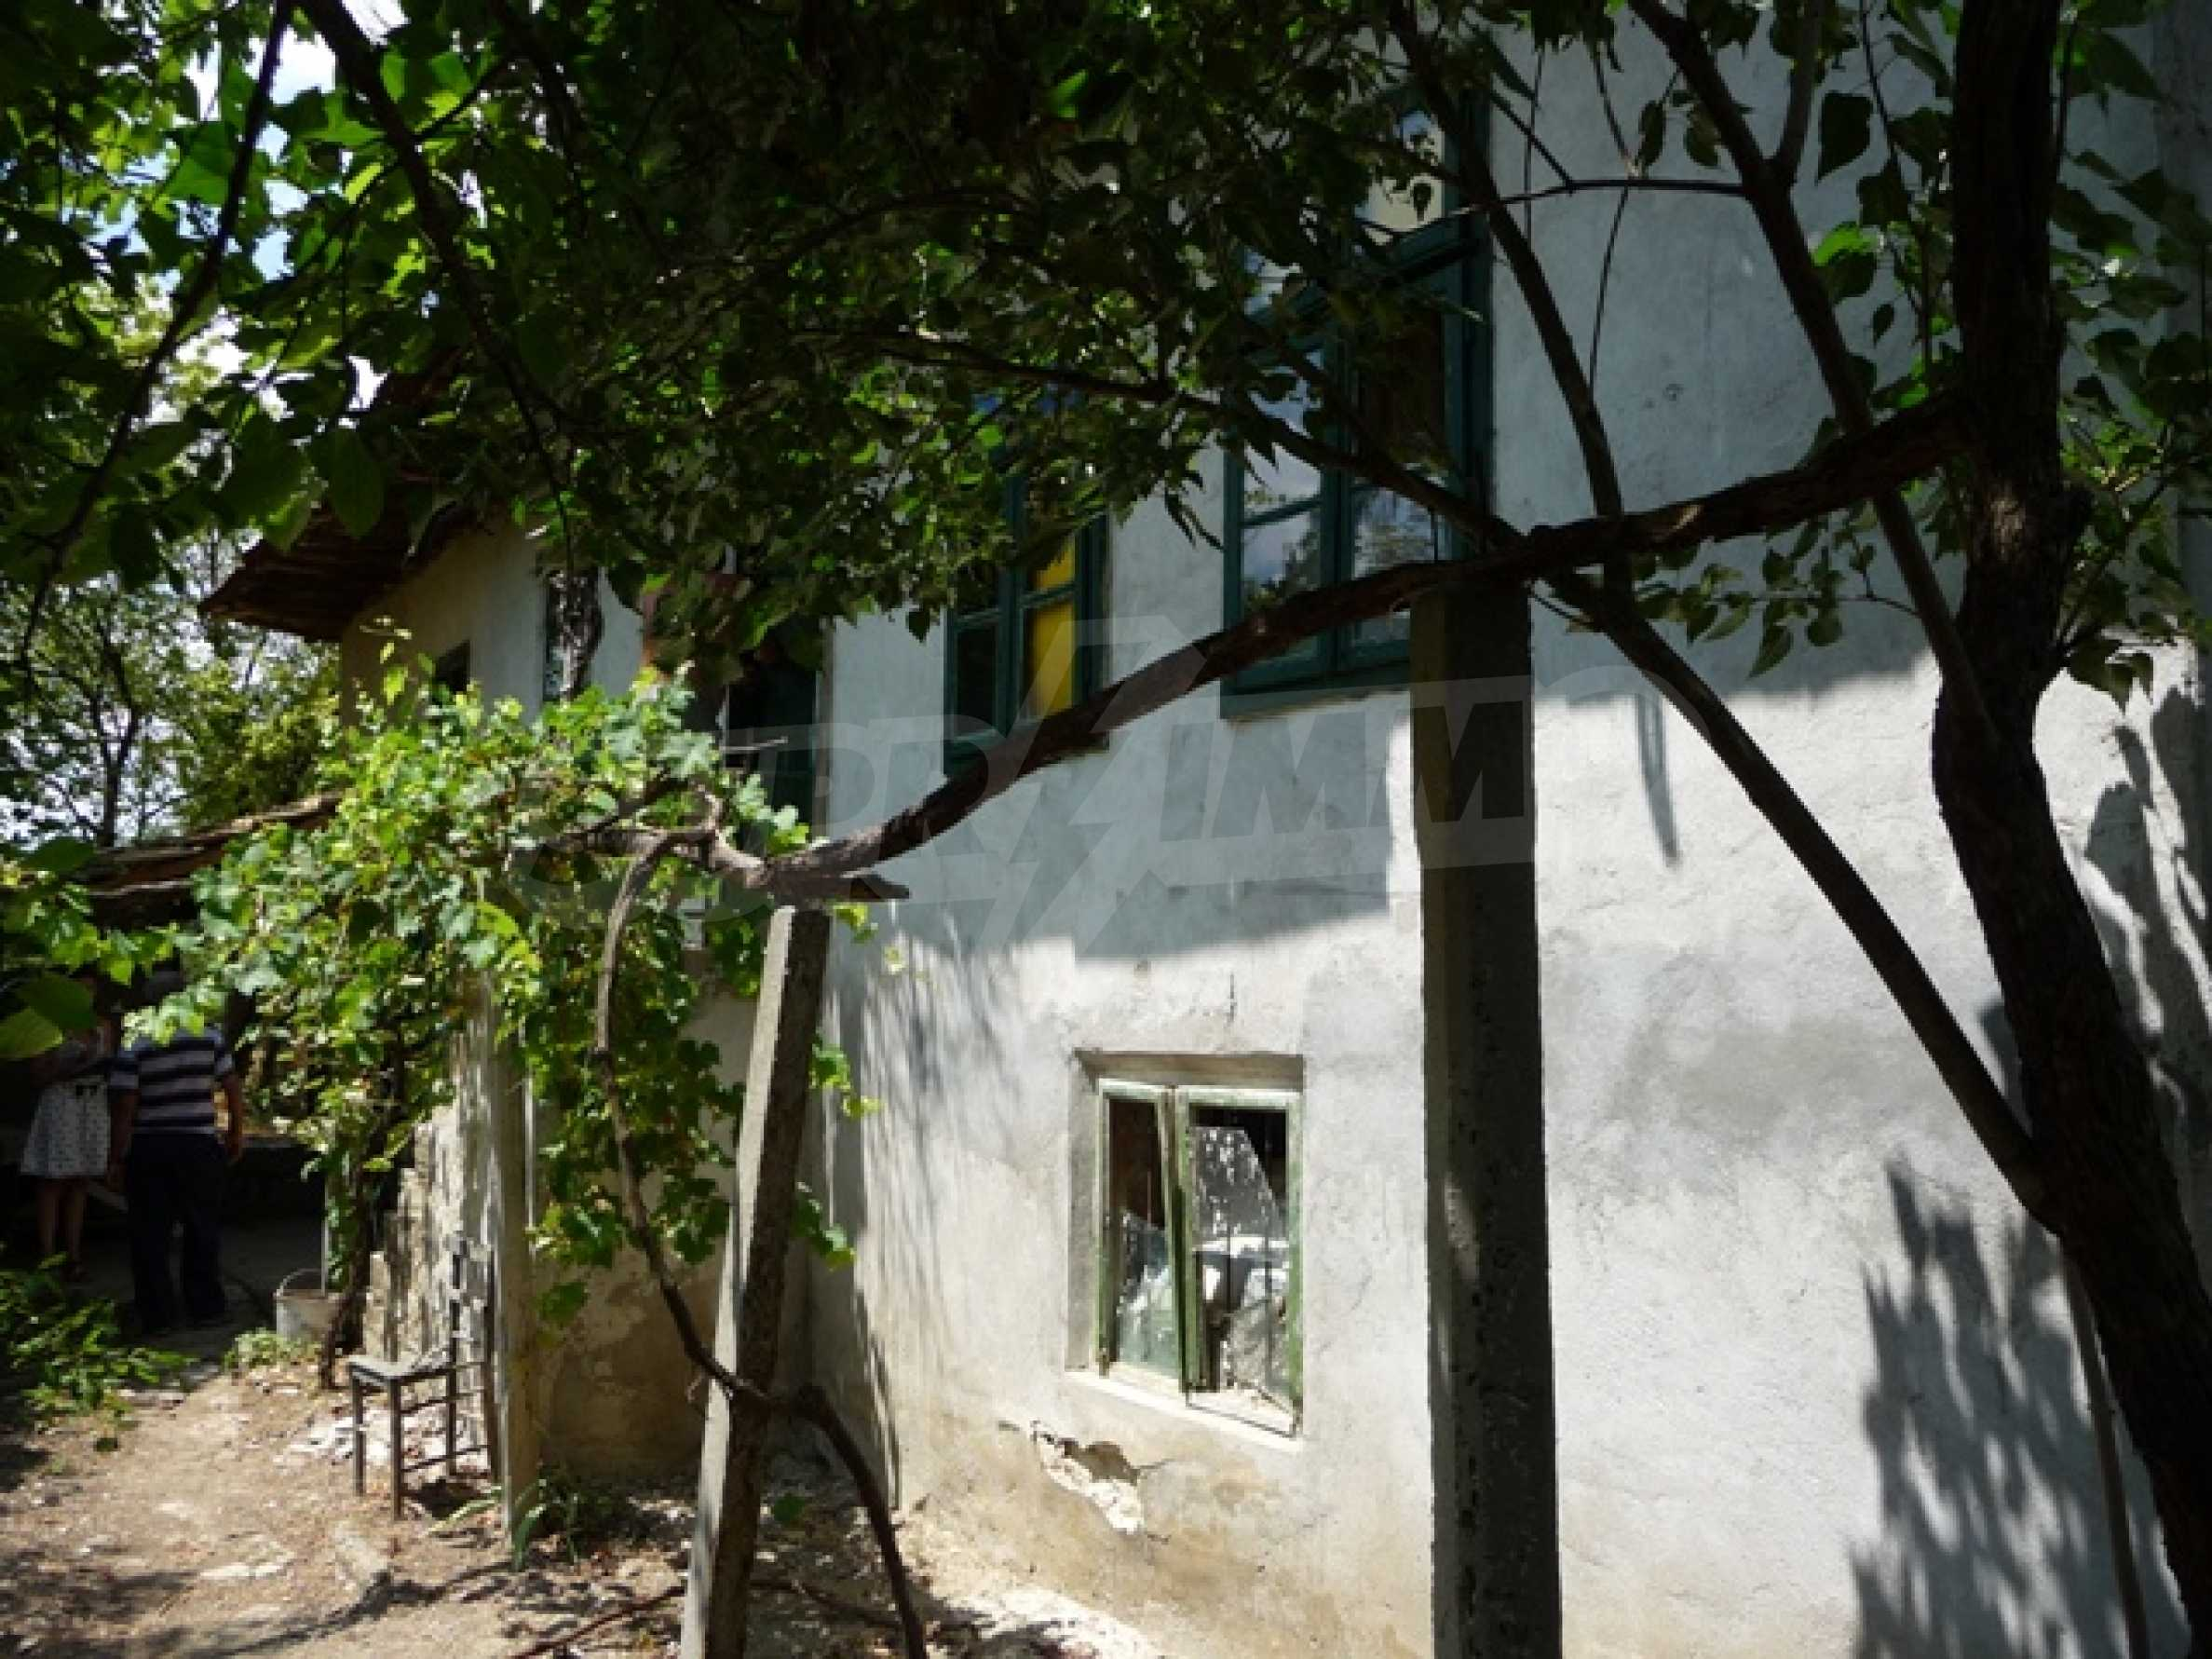 Mogila House 5